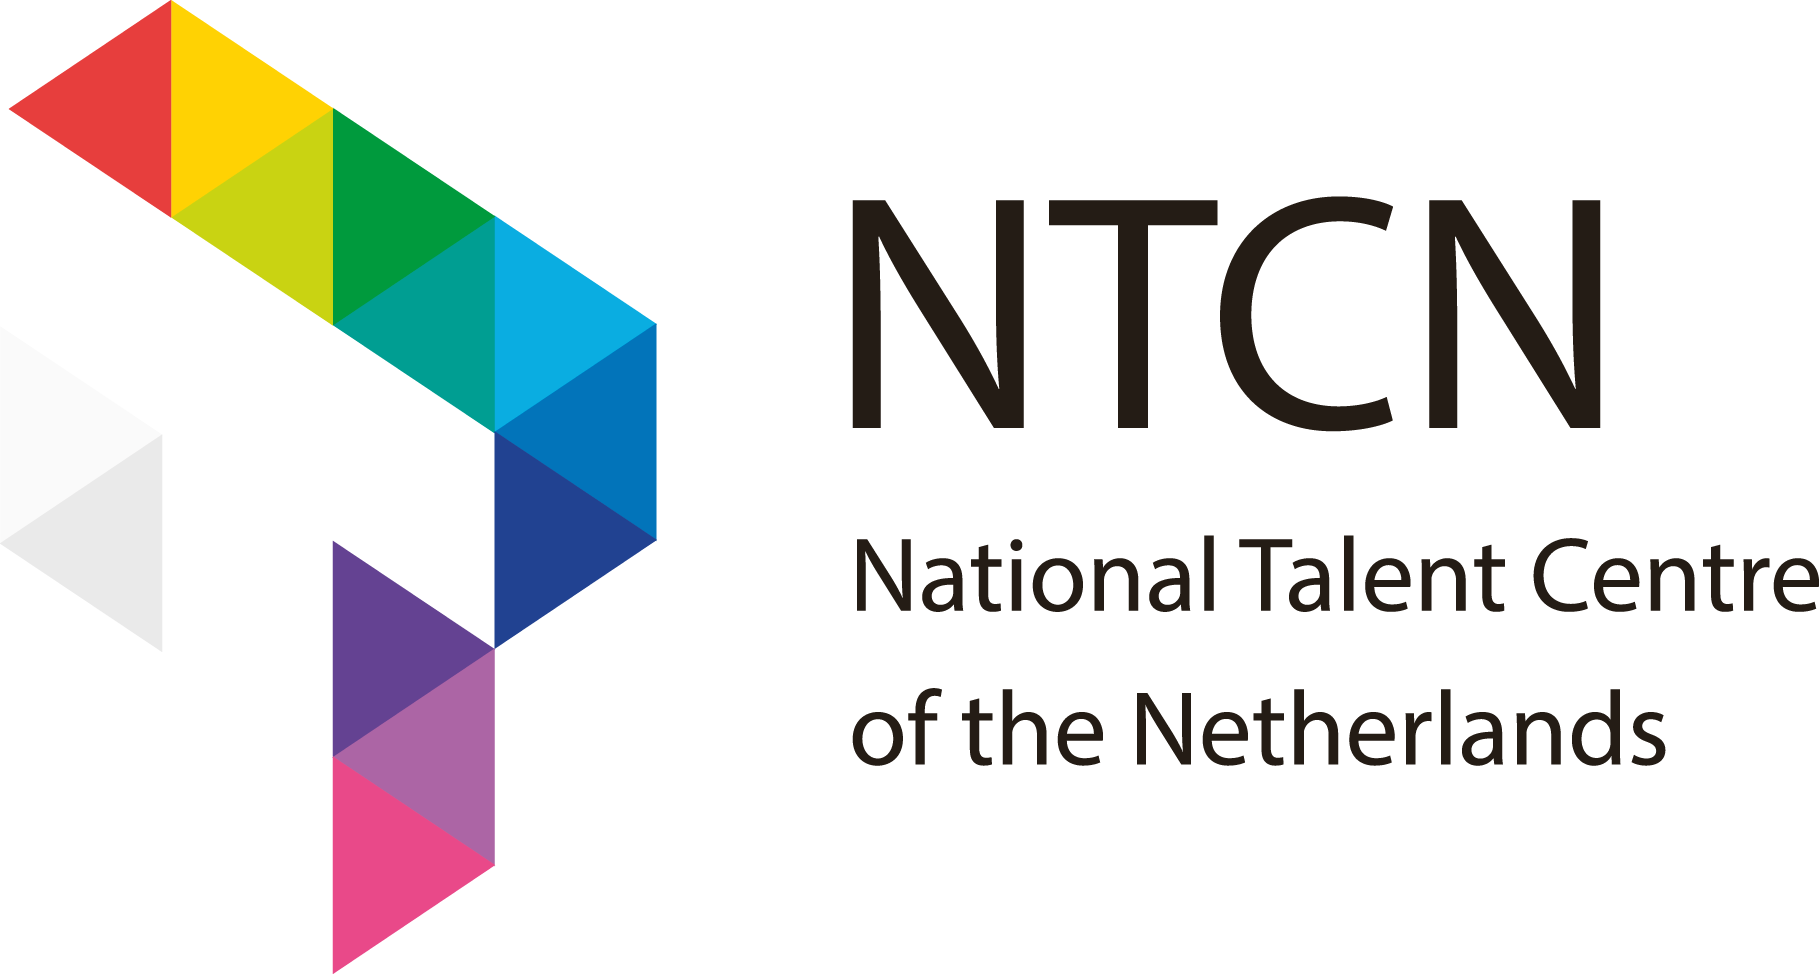 Natonal Talent Center of the Netherlands